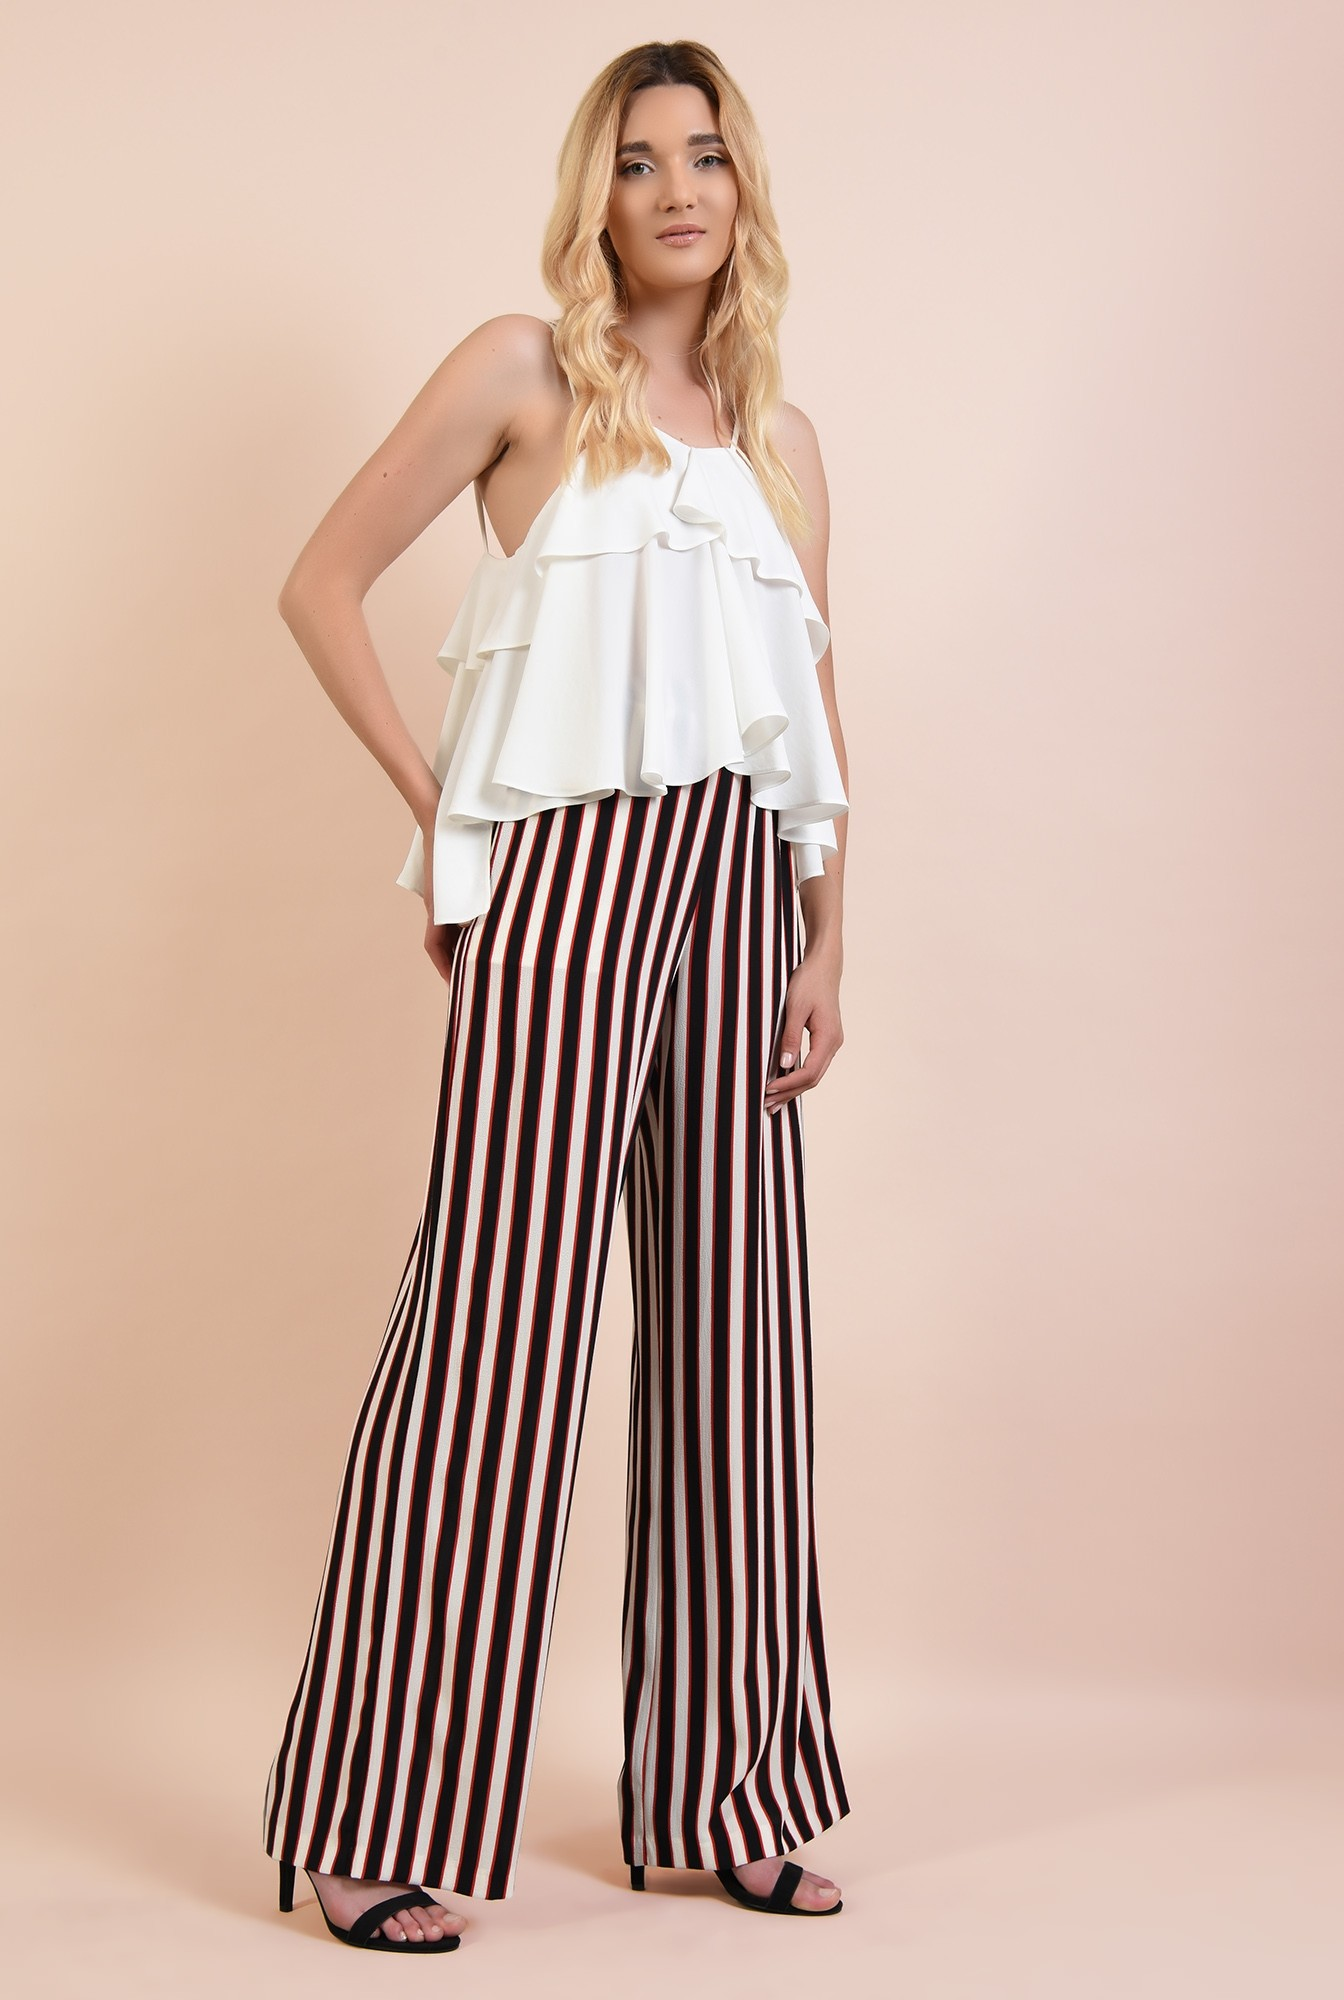 3 - 360 - pantaloni cu dungi, drepti, croi lejer, cu talie elastica, buzunare, Poema